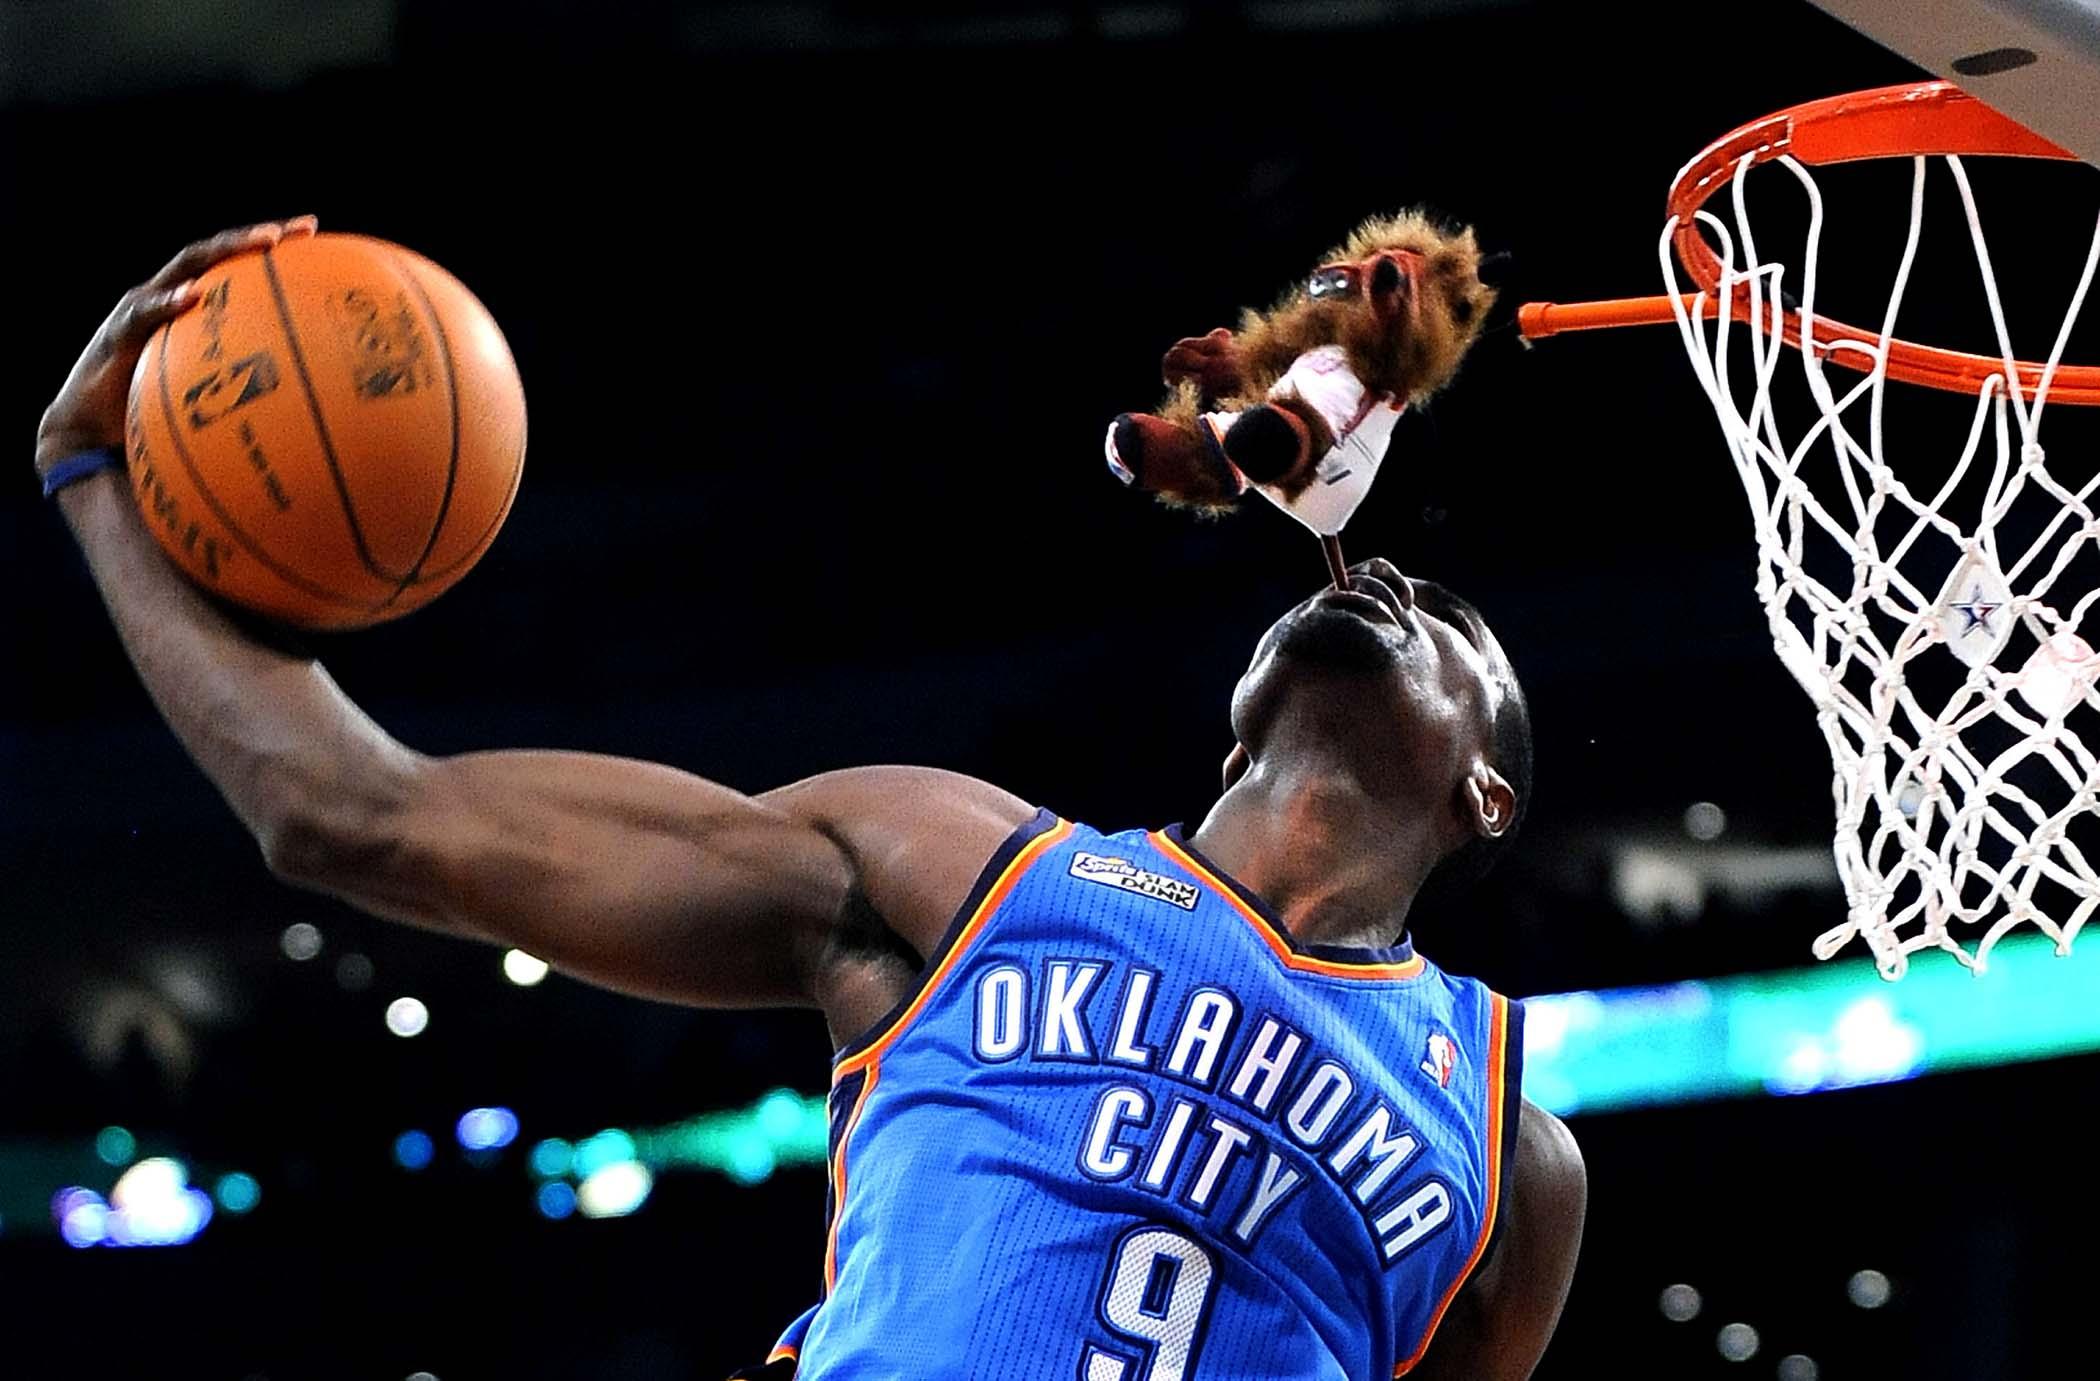 NBA All Star games